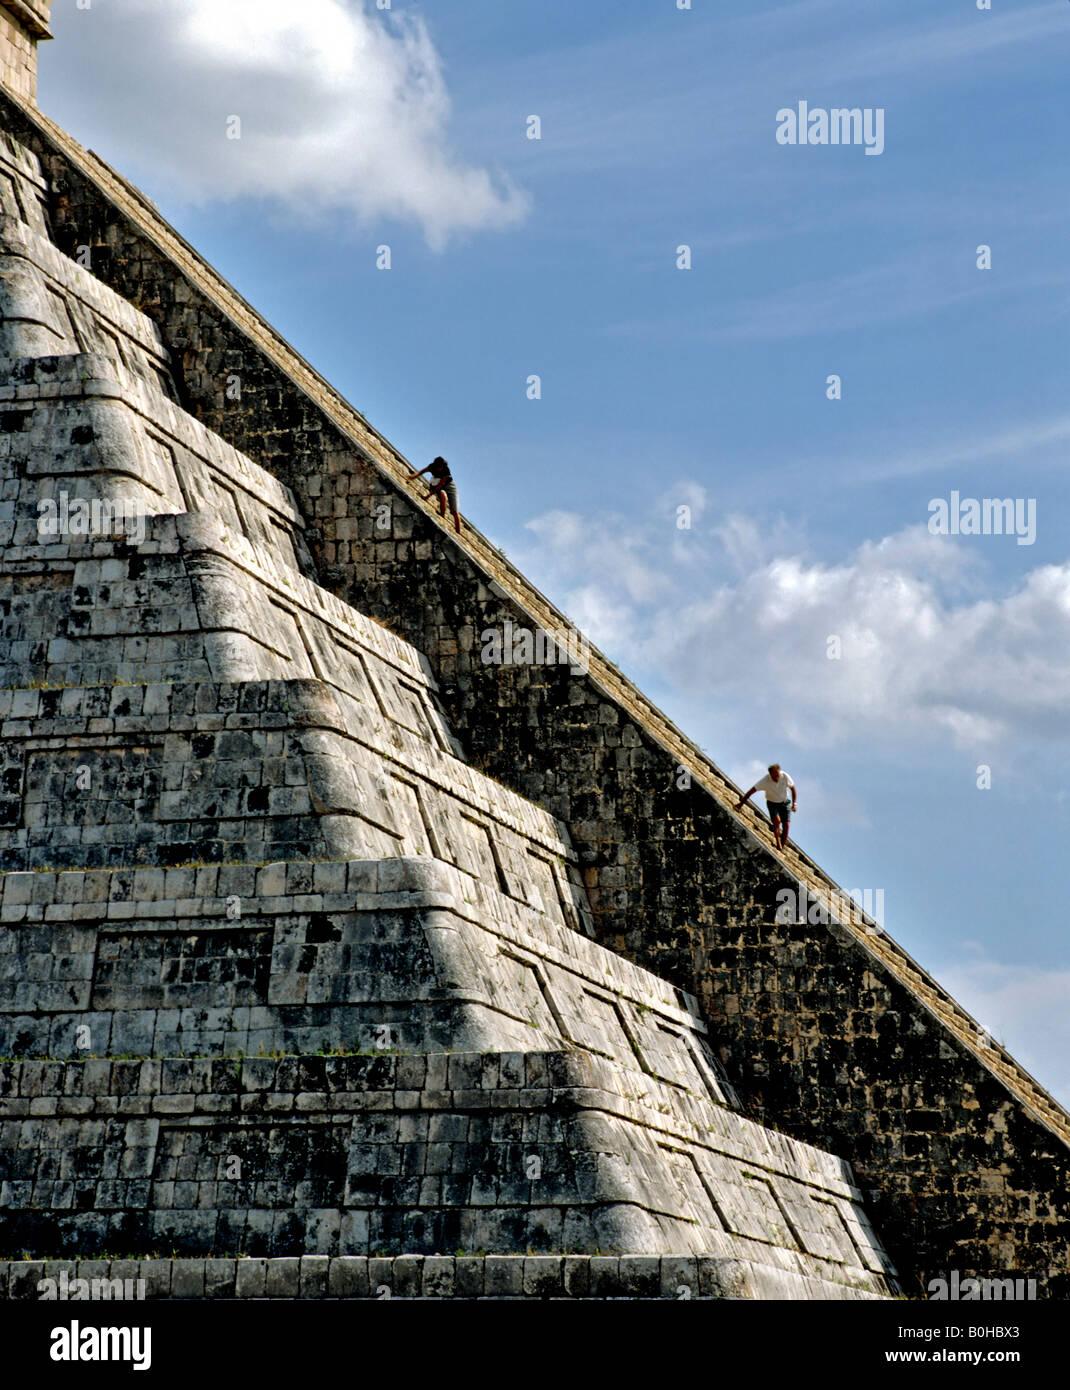 Pyramide, Tempel der Kukulkan, Cichen Itza, Maya-Zivilisation in Yucatan, Mexiko, Mittelamerika Stockbild